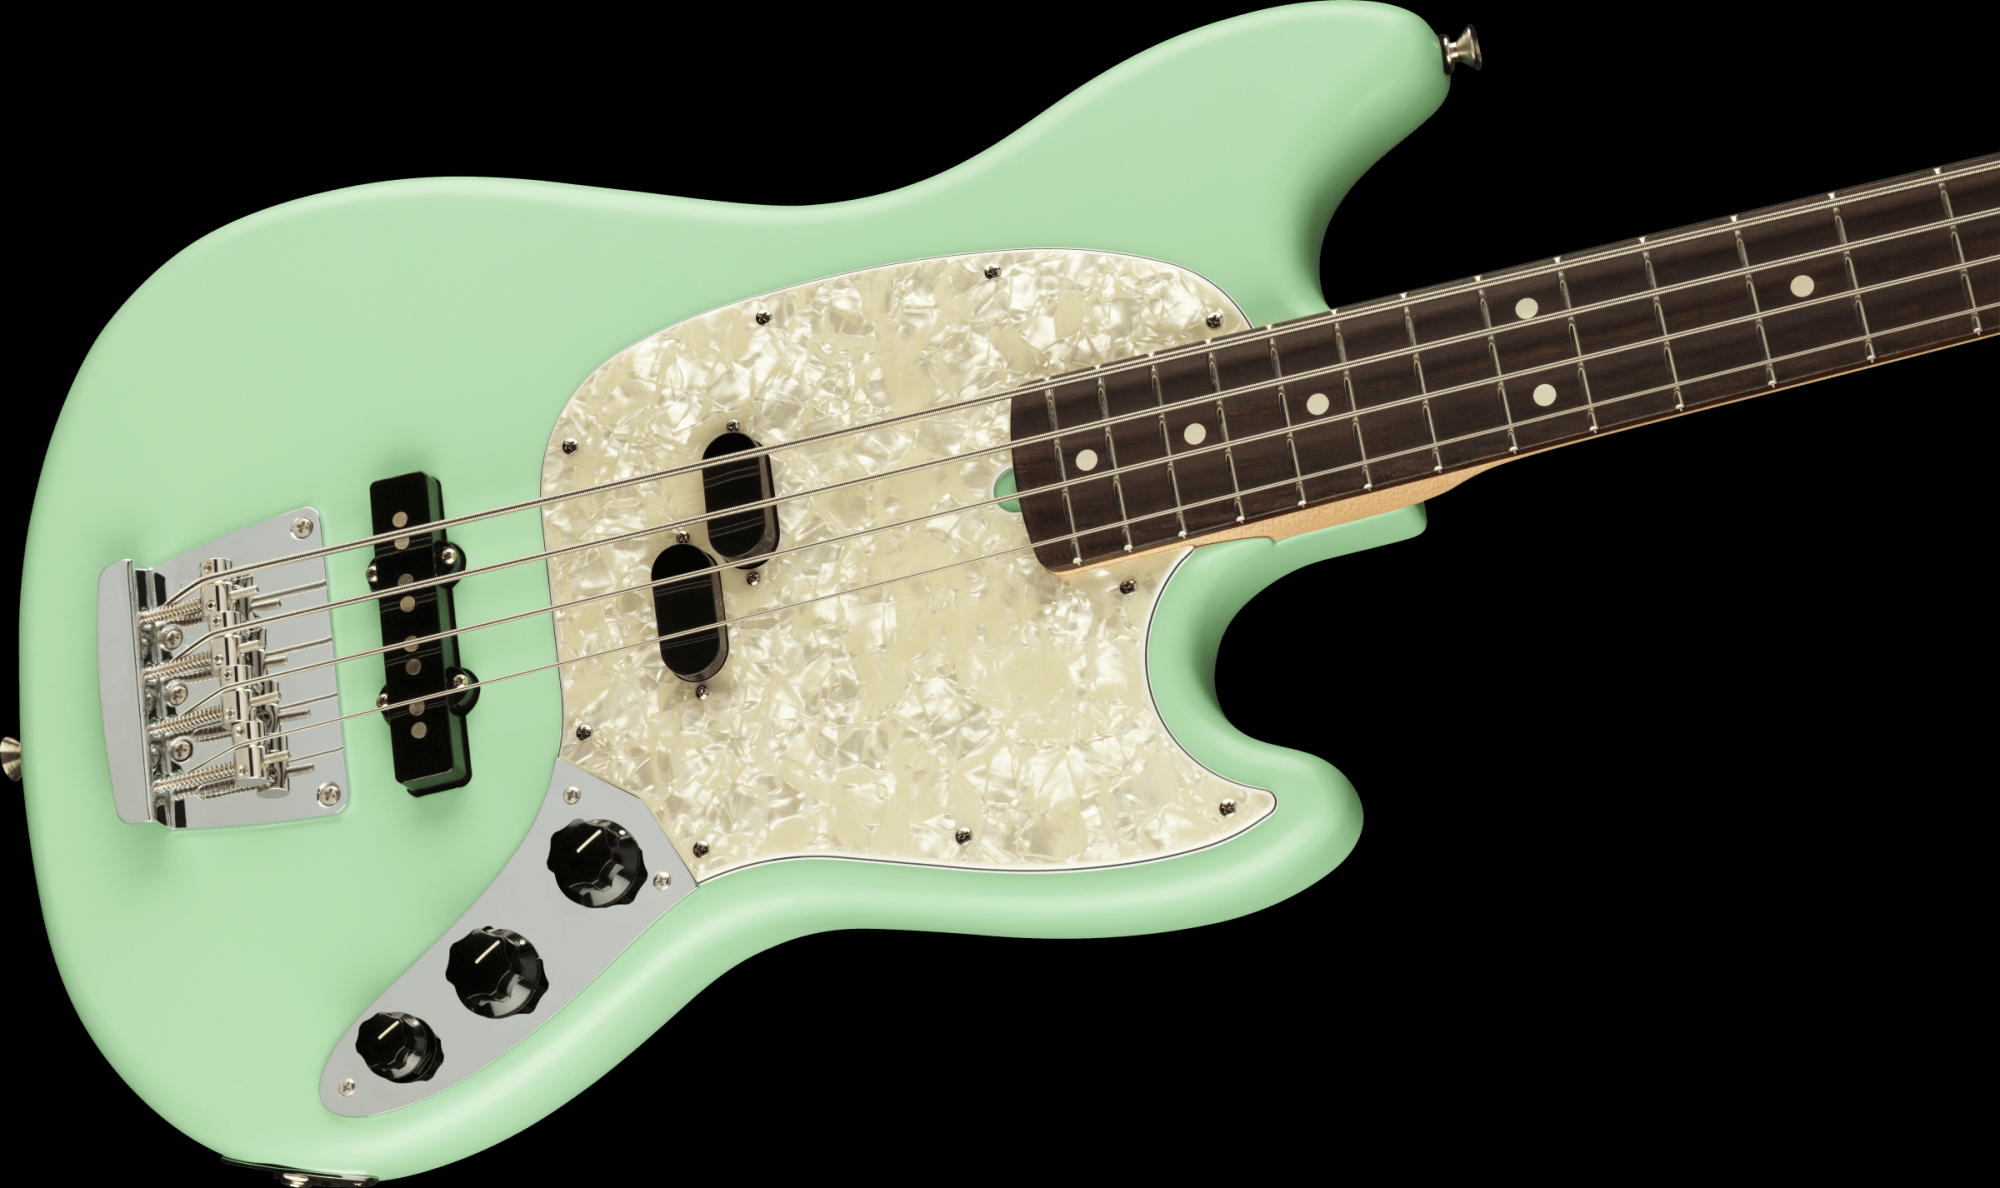 Fender American Performer Mustang Bass Rosewood Fingerboard - Satin Surf Green